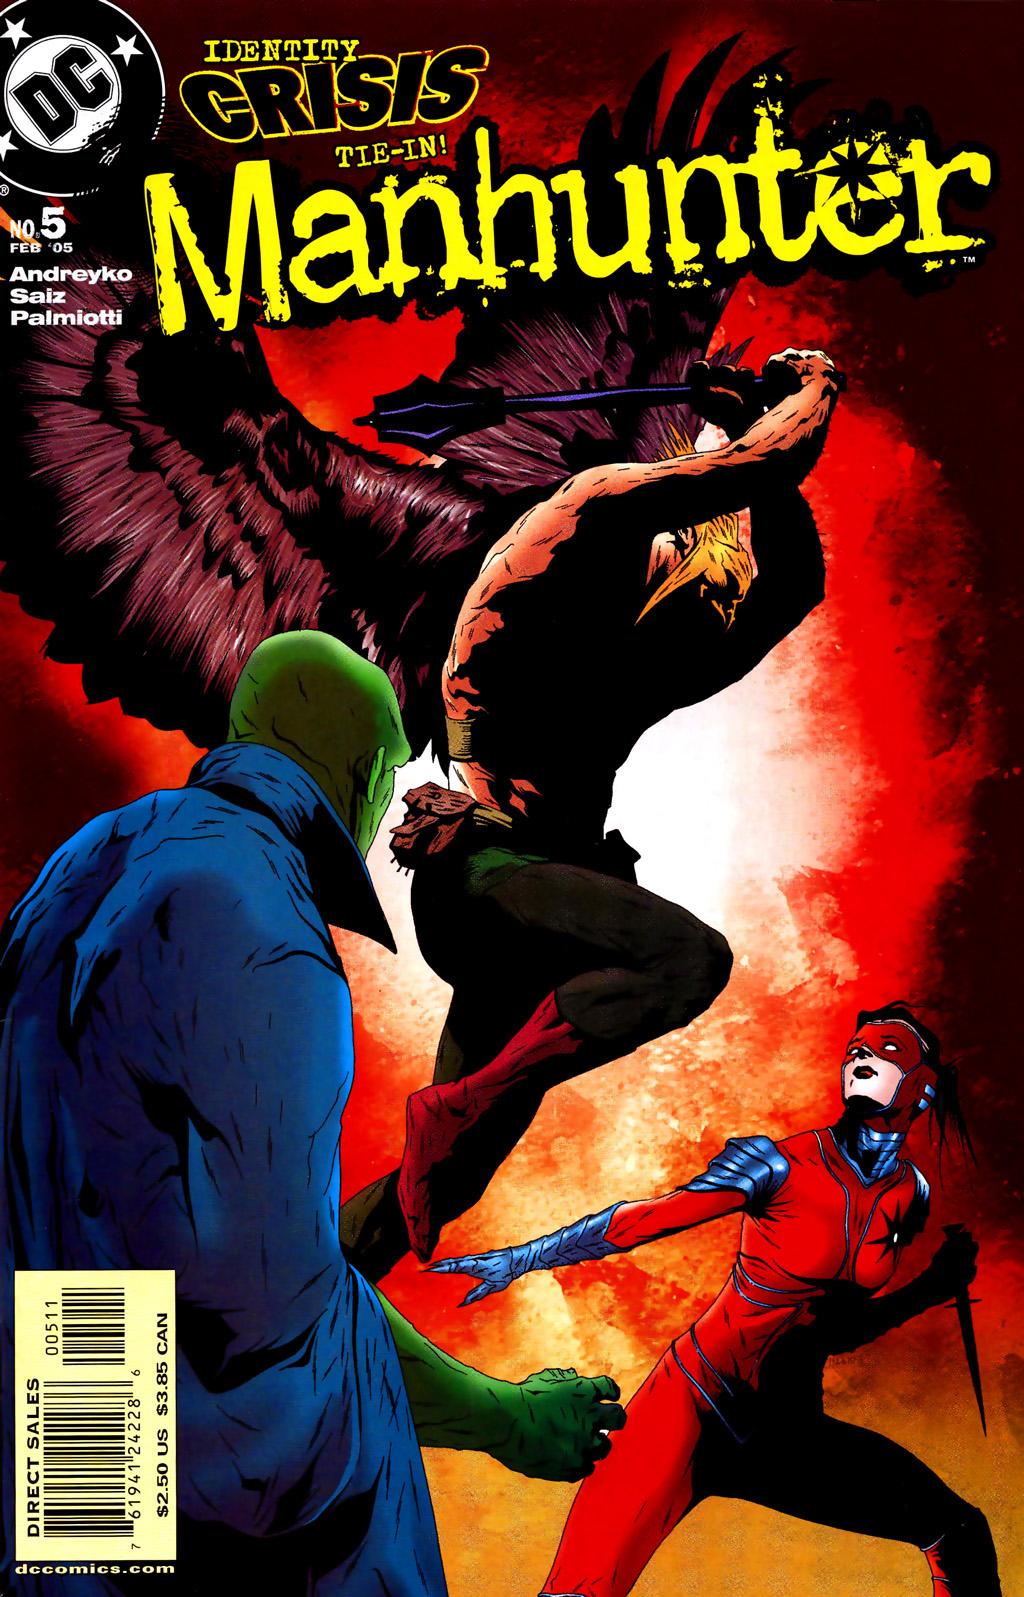 Manhunter (2004) issue 5 - Page 1